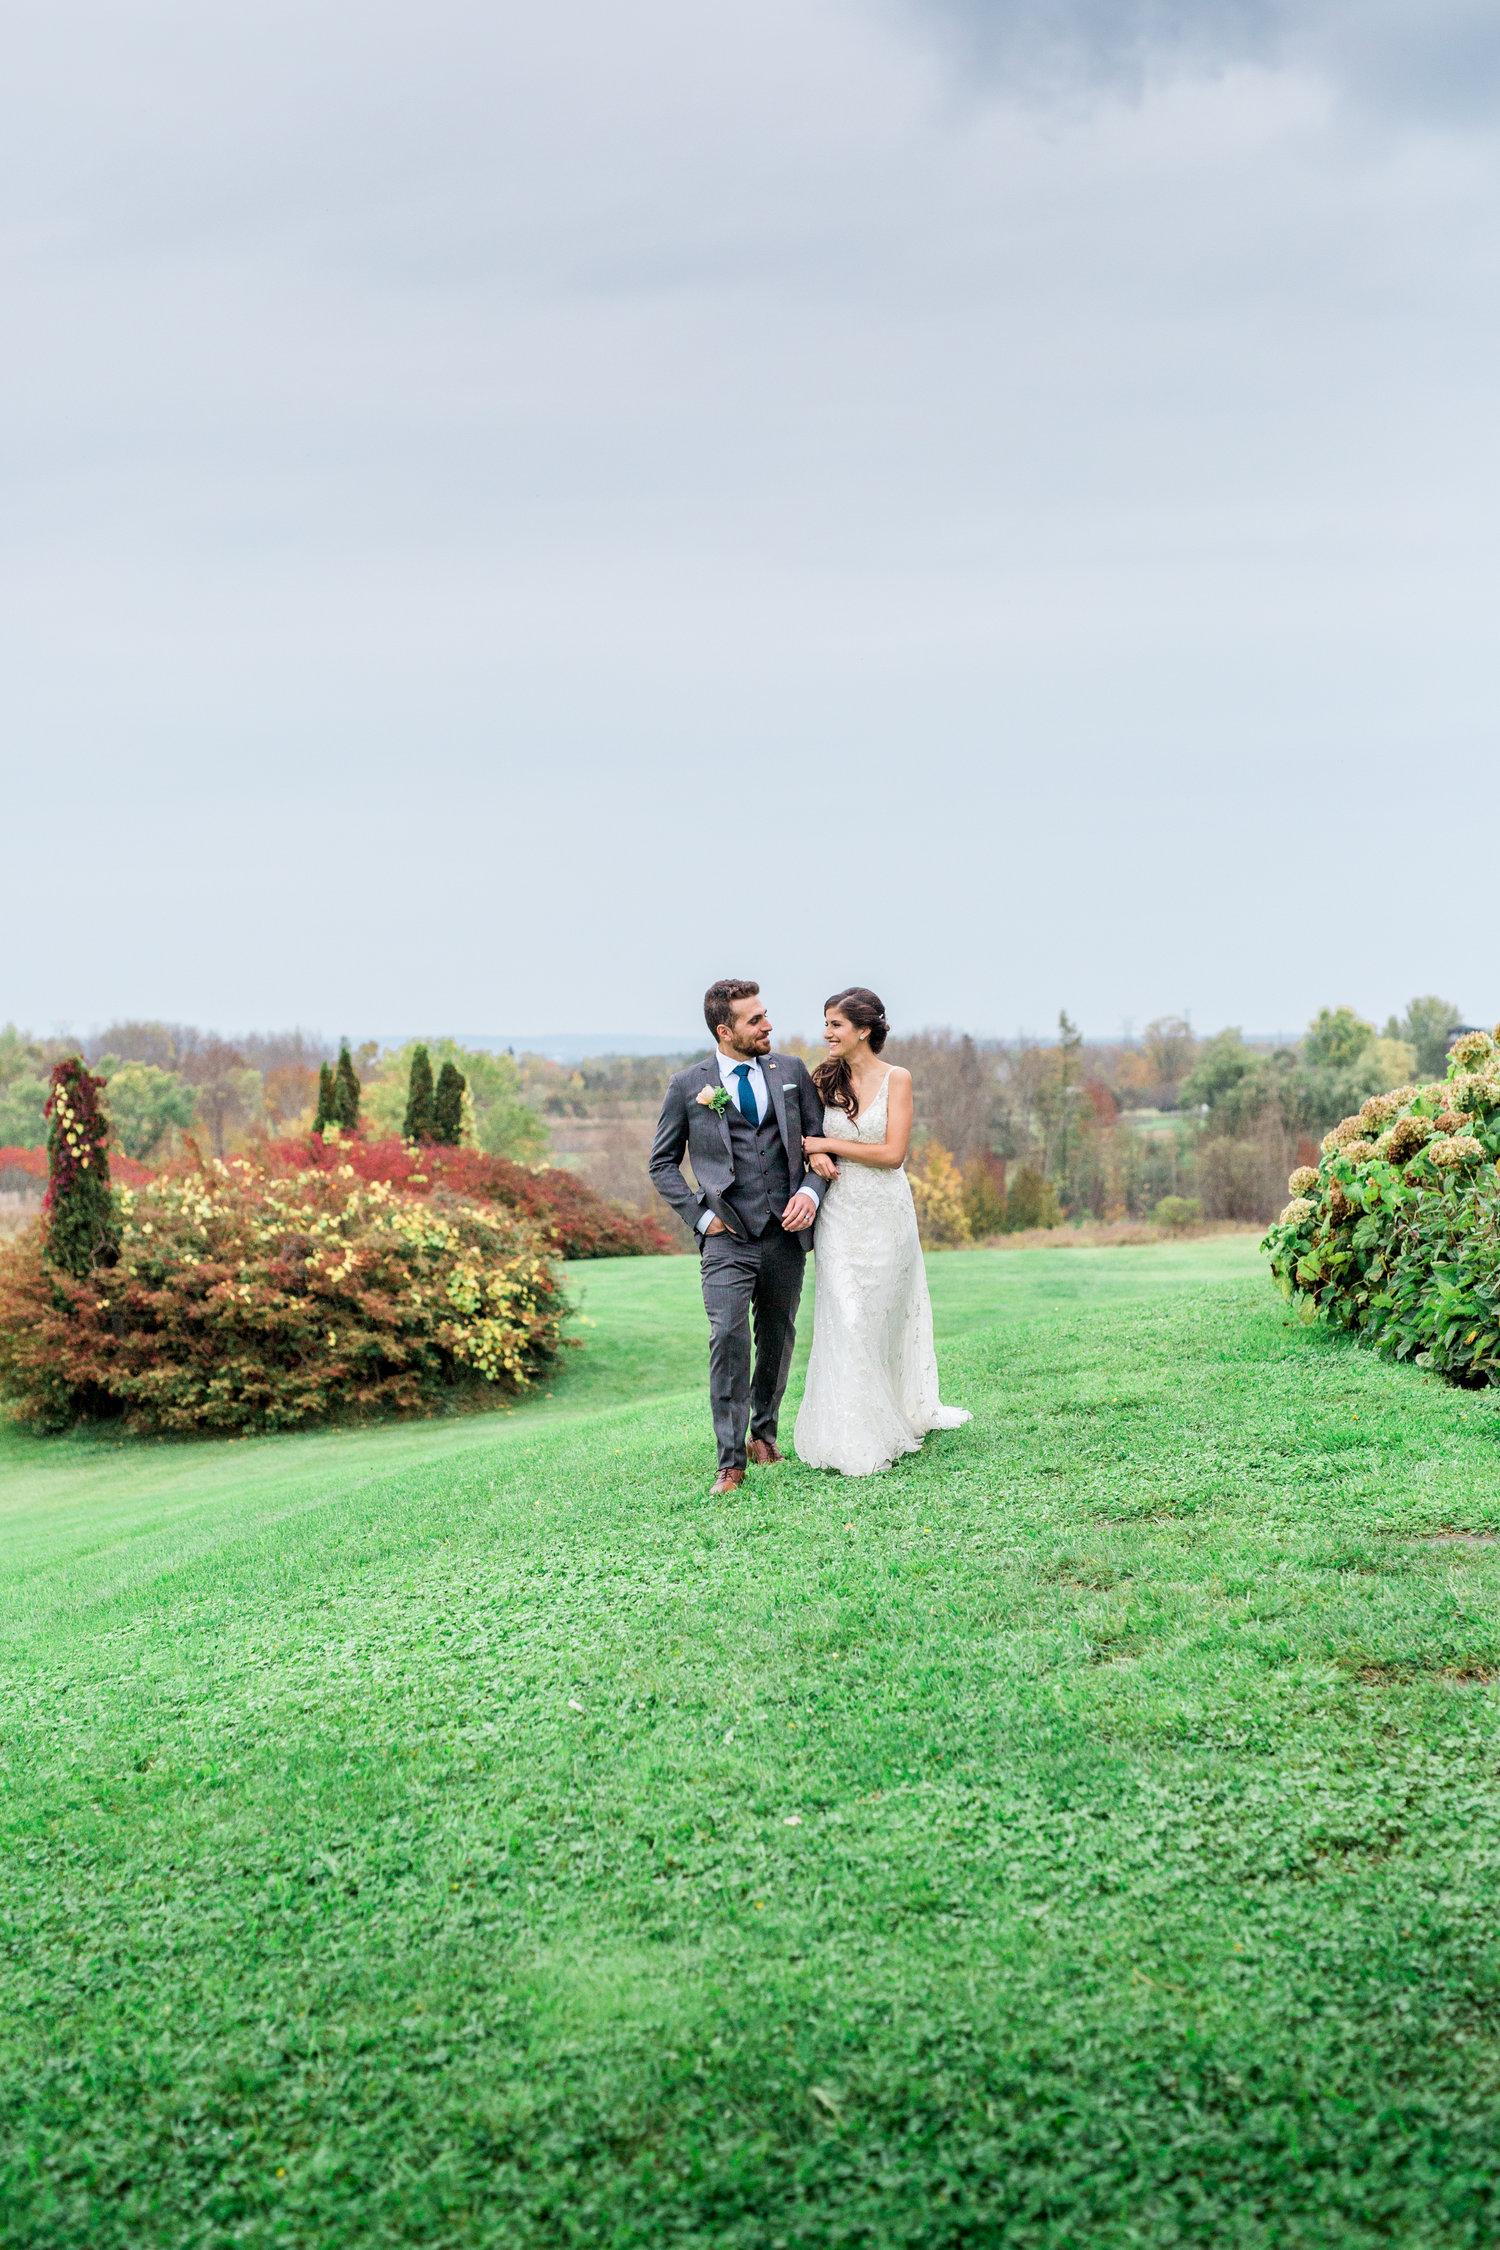 Amir-Golbazi-Danielle-Giroux-Photography_Toronto-Wedding_Cedarwood_Rachel-Paul_450.jpg